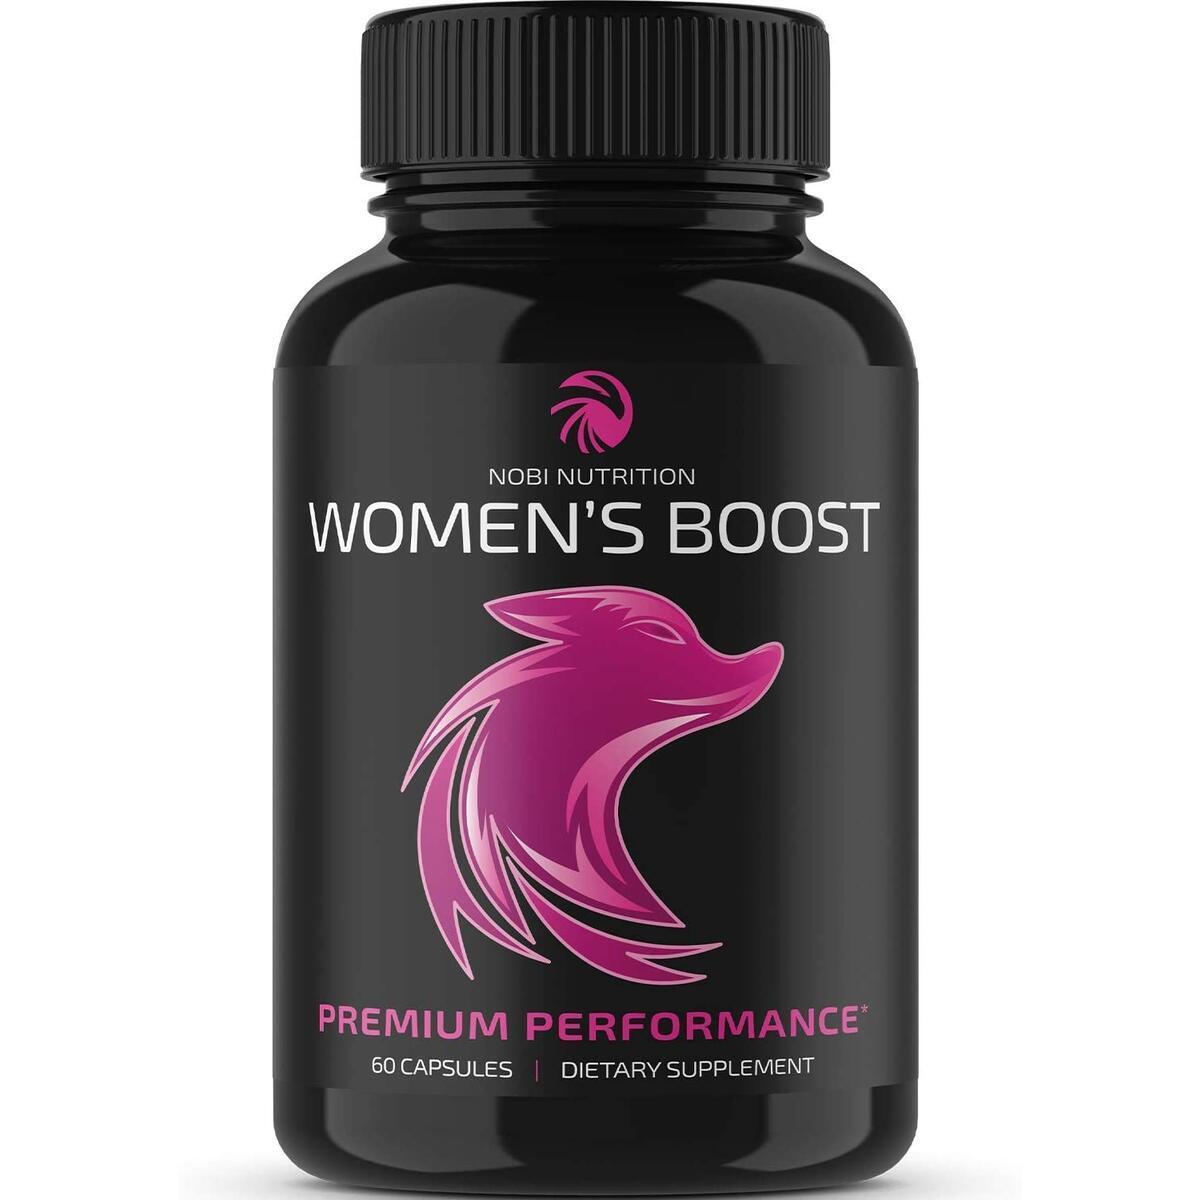 Premium Women's Boost - Women Health Female Enhancement Pills - Hormone Balance Complex for Women - Support Increased Desire, Passion, Endurance, Energy & Mood (60 Capsules)